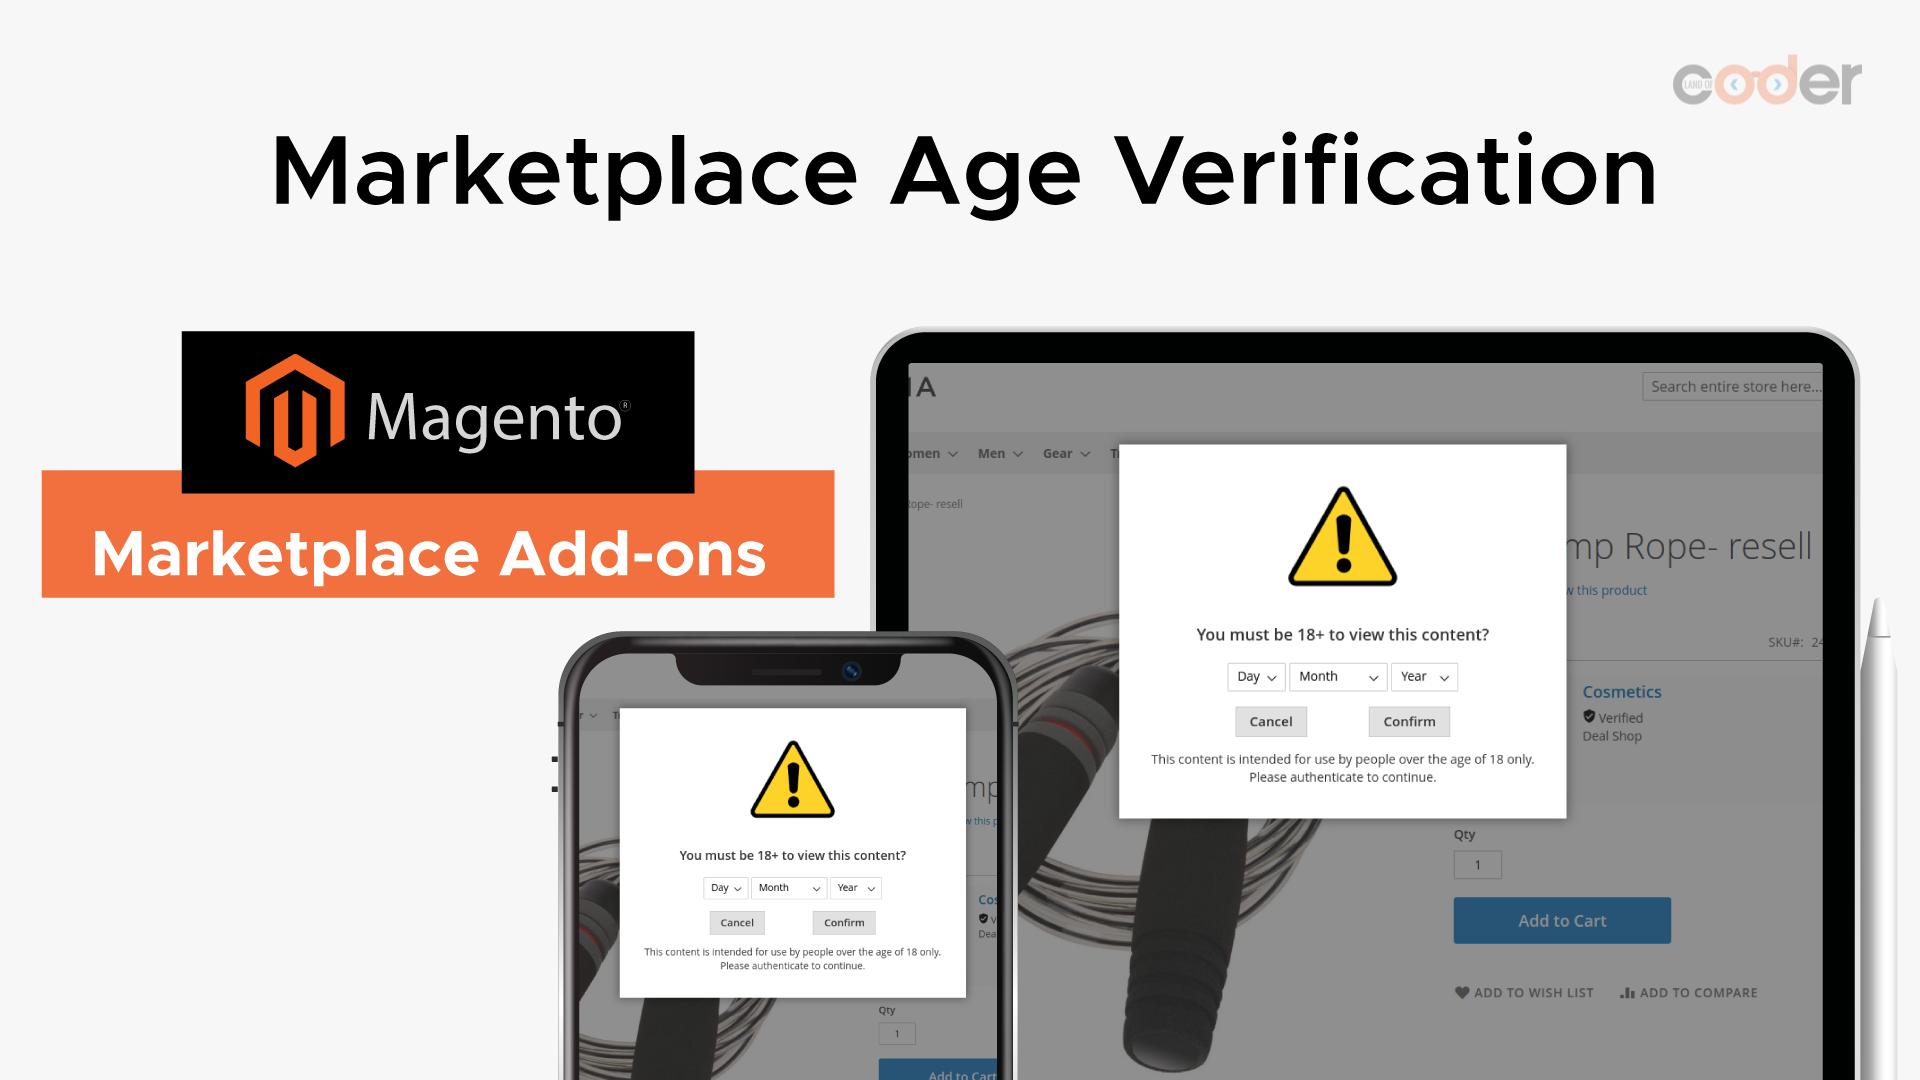 How to use Marketplace Age Verification